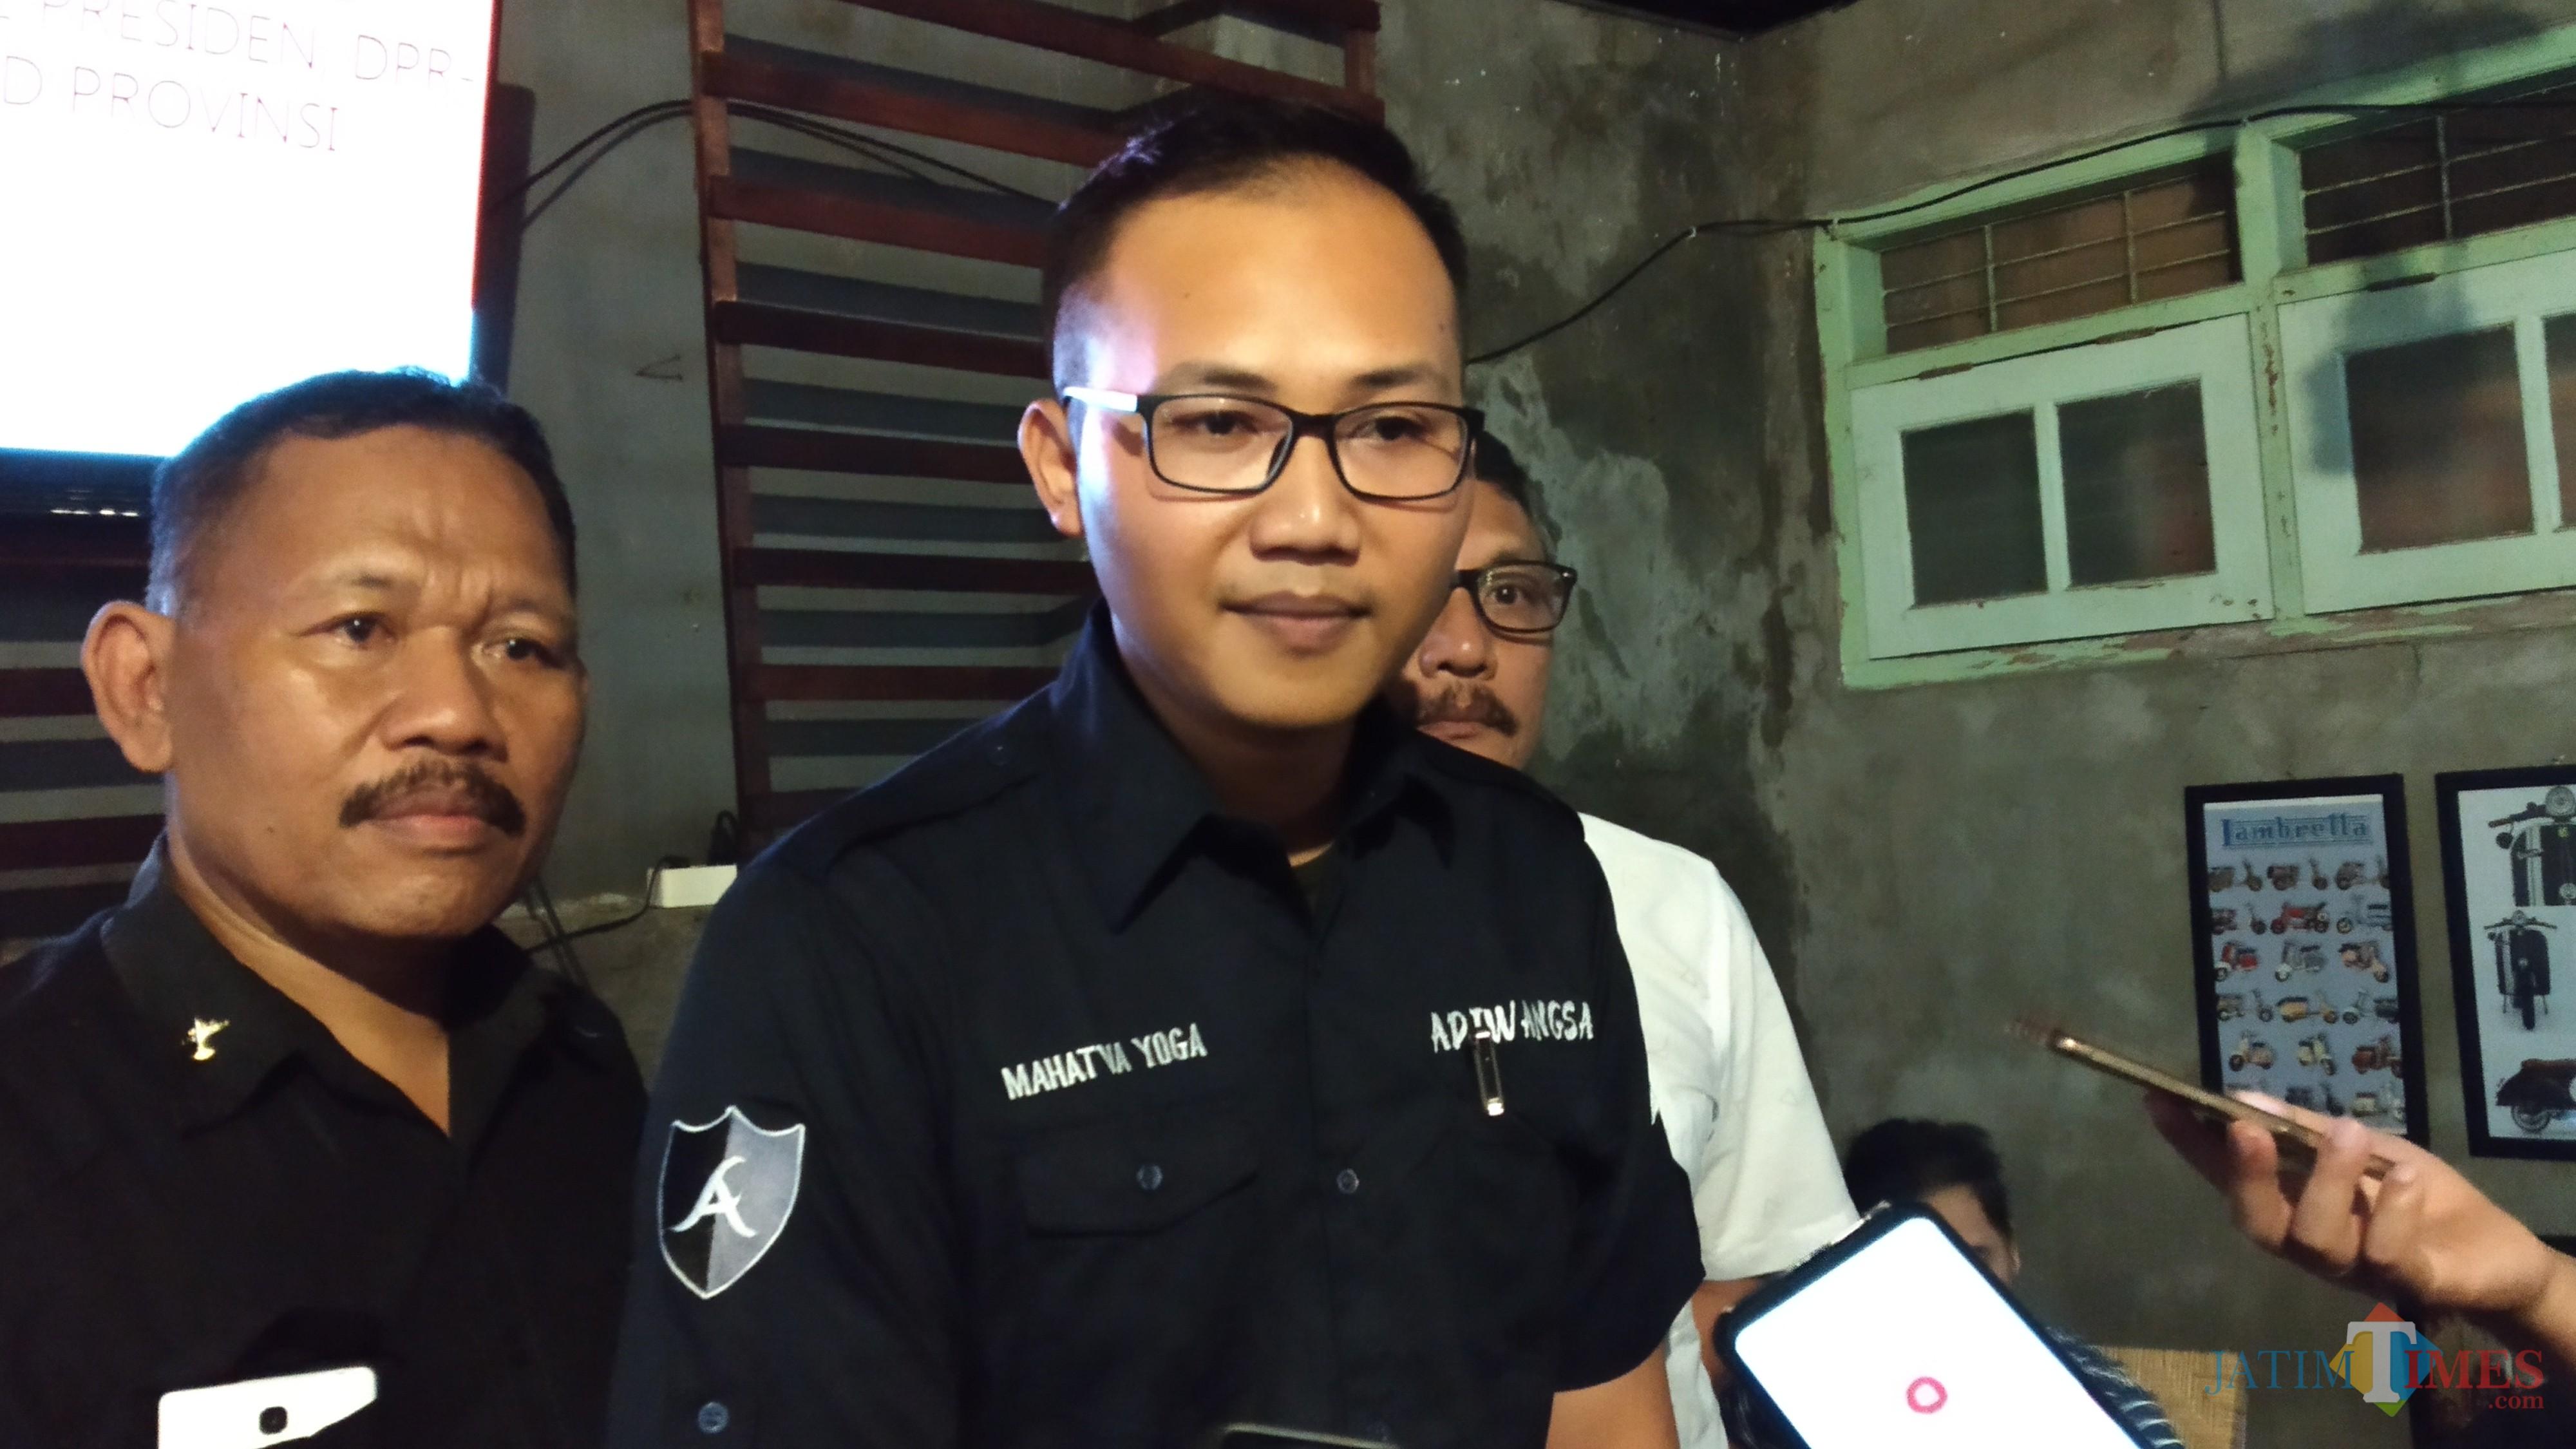 Direktur Lembaga Adiwangsa, Mahatva Yoga, saat memaparkan hasil survei partisipasi politik Kota Malang serta elektabilitas para calon dalam Pemilu 2019. (Pipit Anggraeni/MalangTIMES).